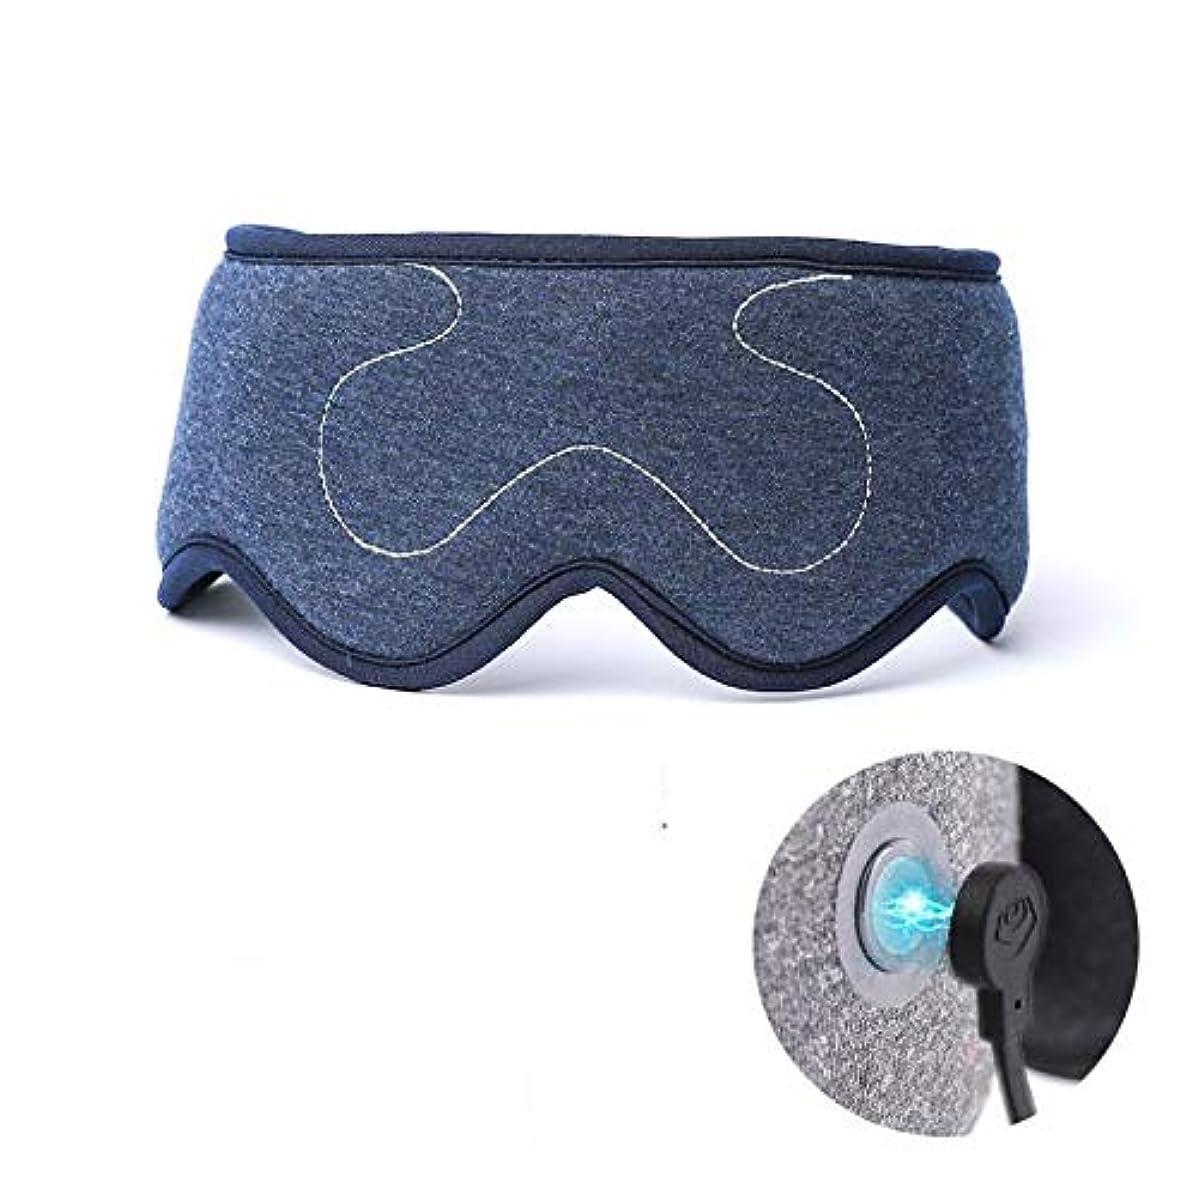 NOTE HANRIVER 2018目の疲れを軽減するために加熱蒸気を目隠しusb加熱暖房蒸気3 d大シェーディング睡眠マスク